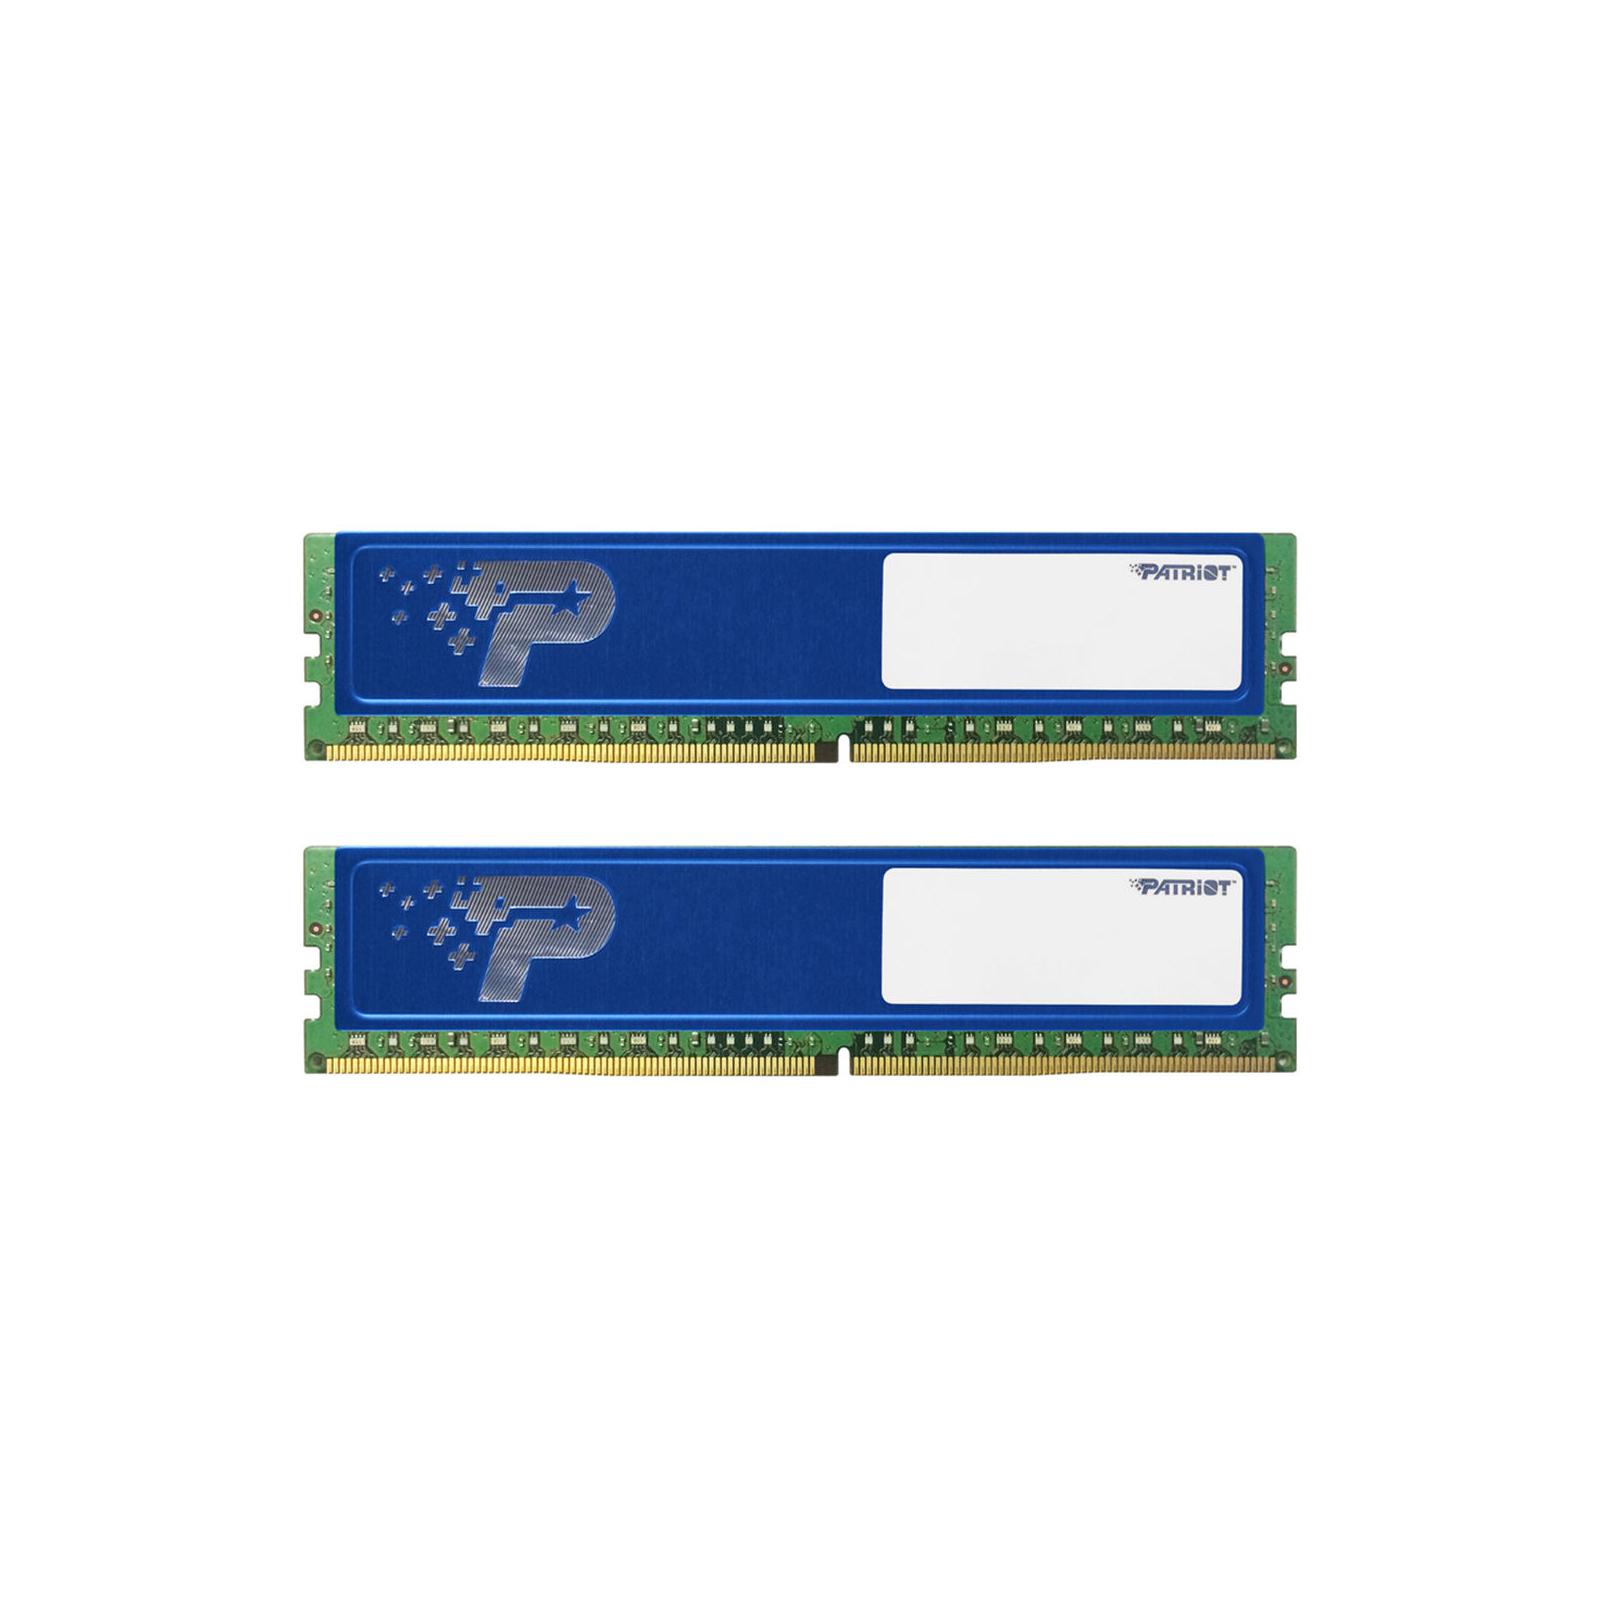 Модуль памяти для компьютера DDR4 8GB (2x4GB) 2133 MHz Patriot (PSD48G2133KH)